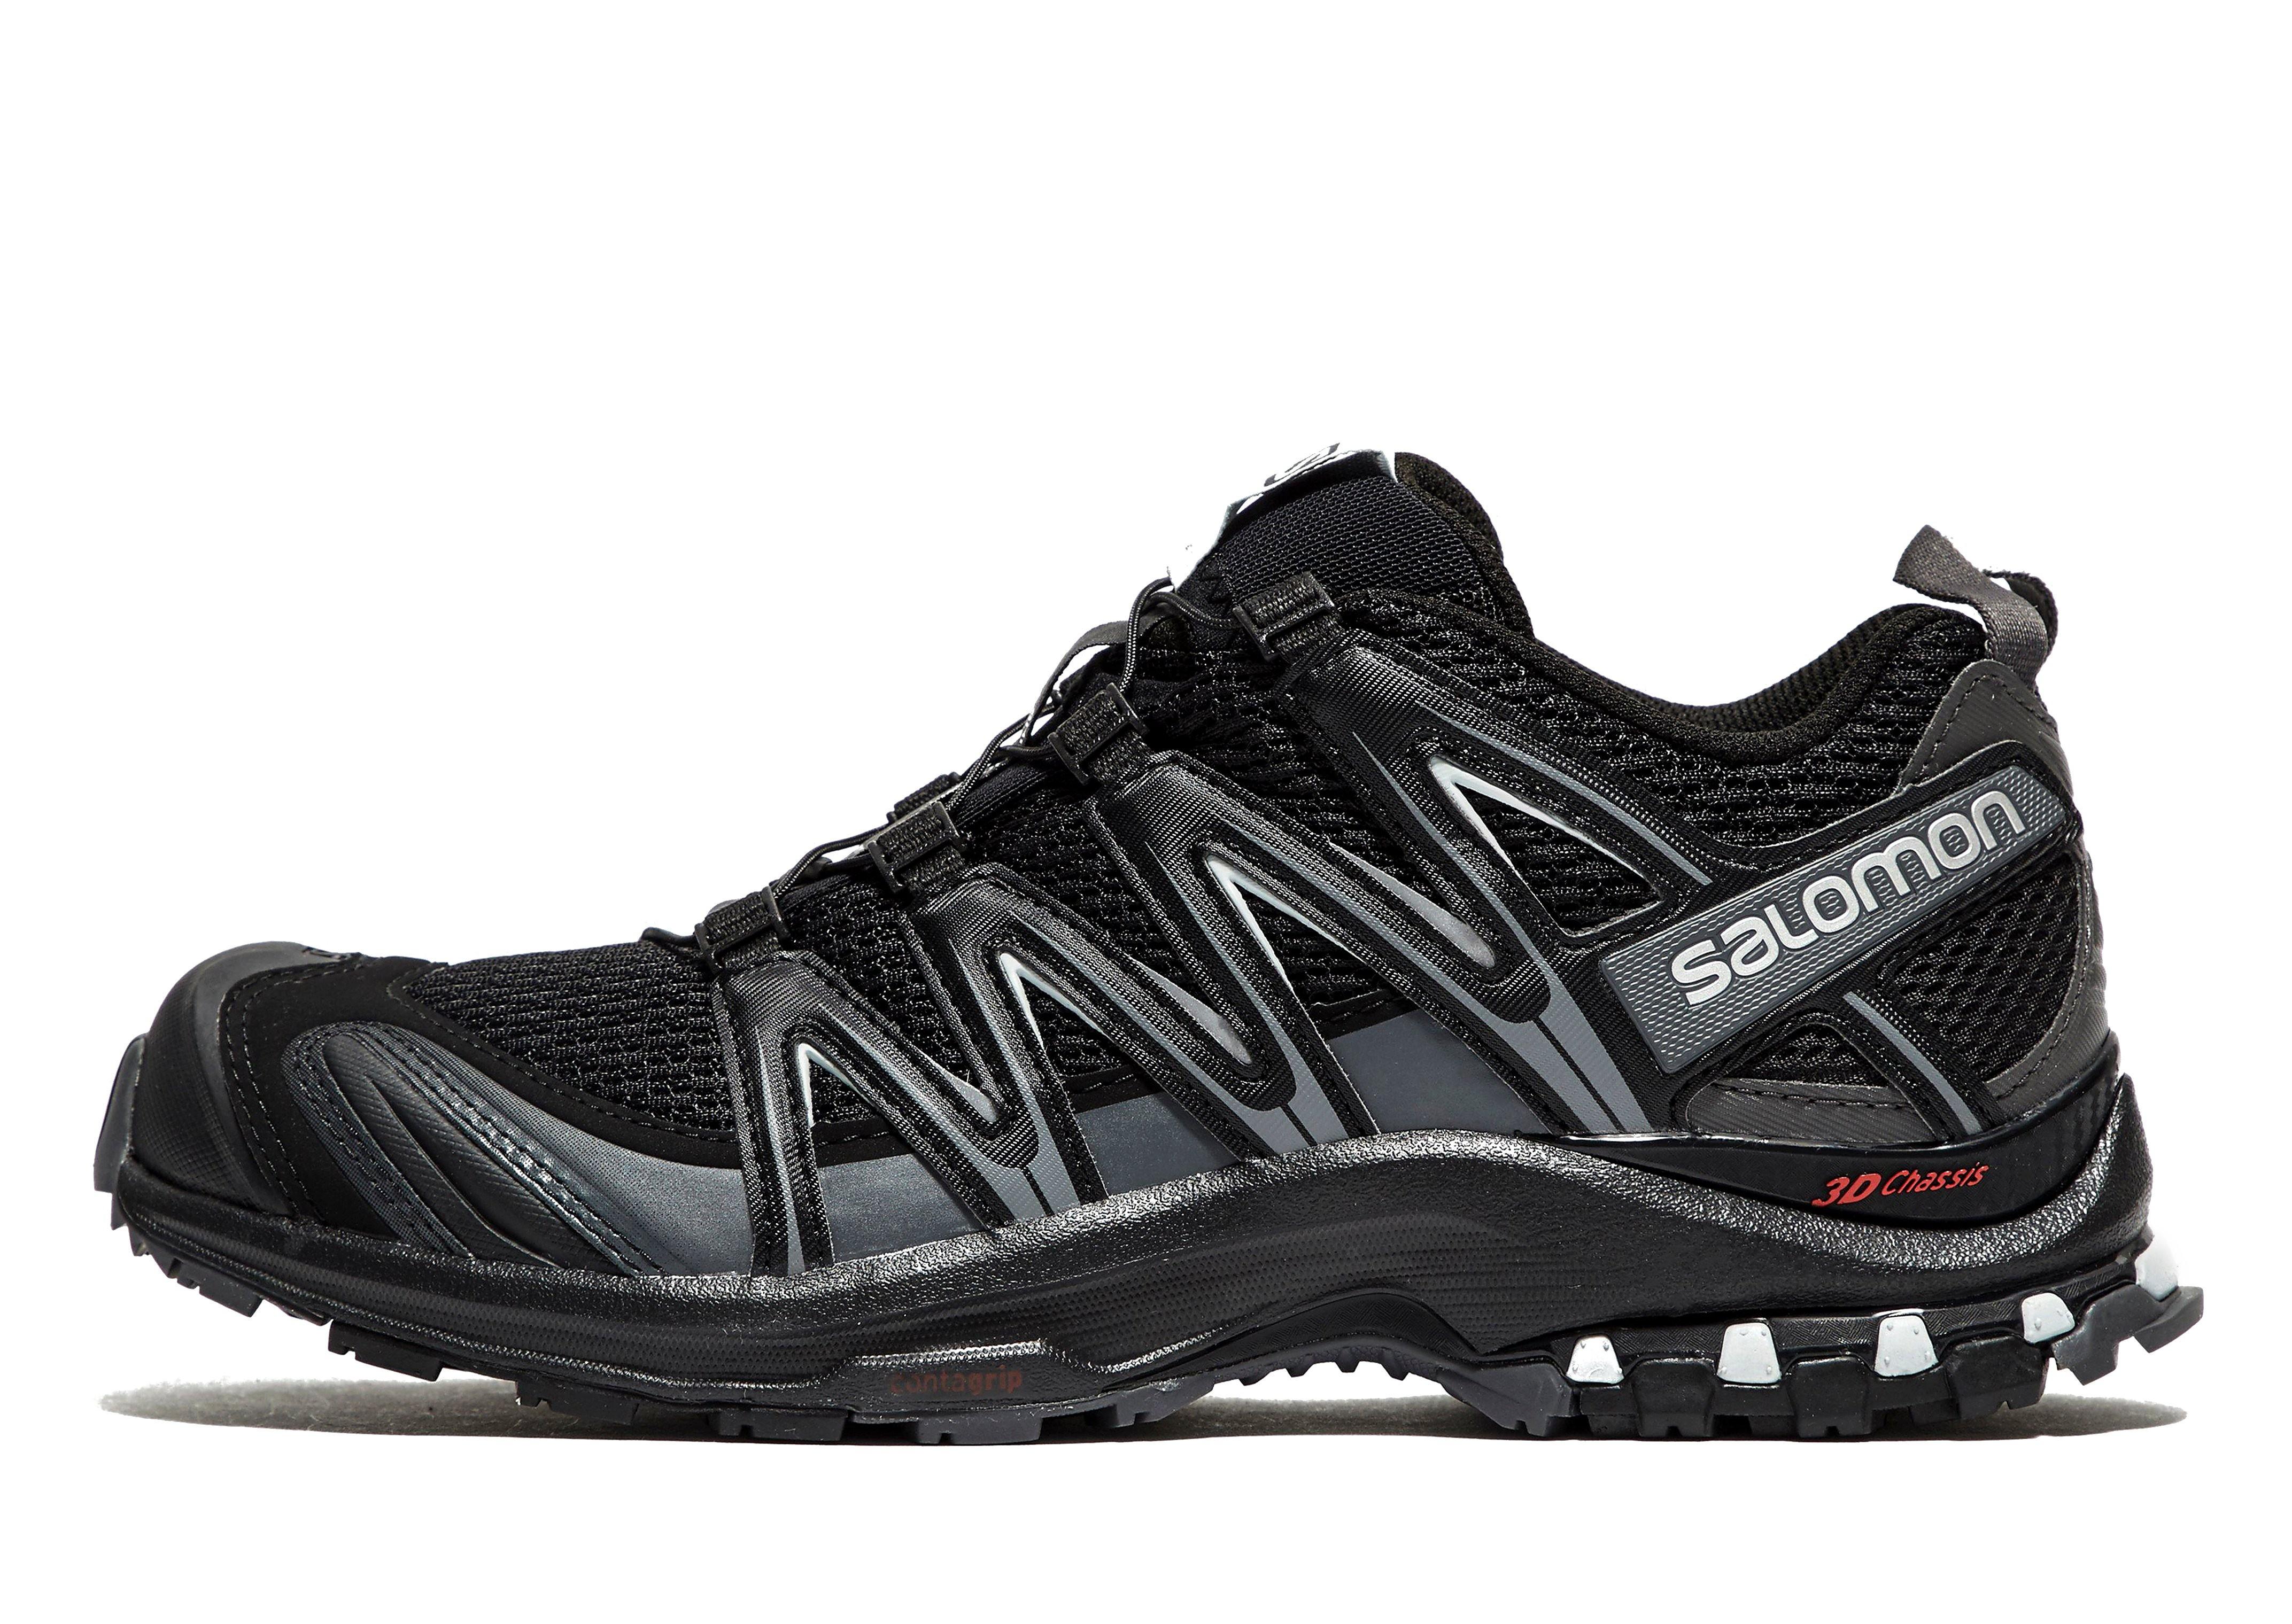 Salomon XA Pro 3D Running Shoes